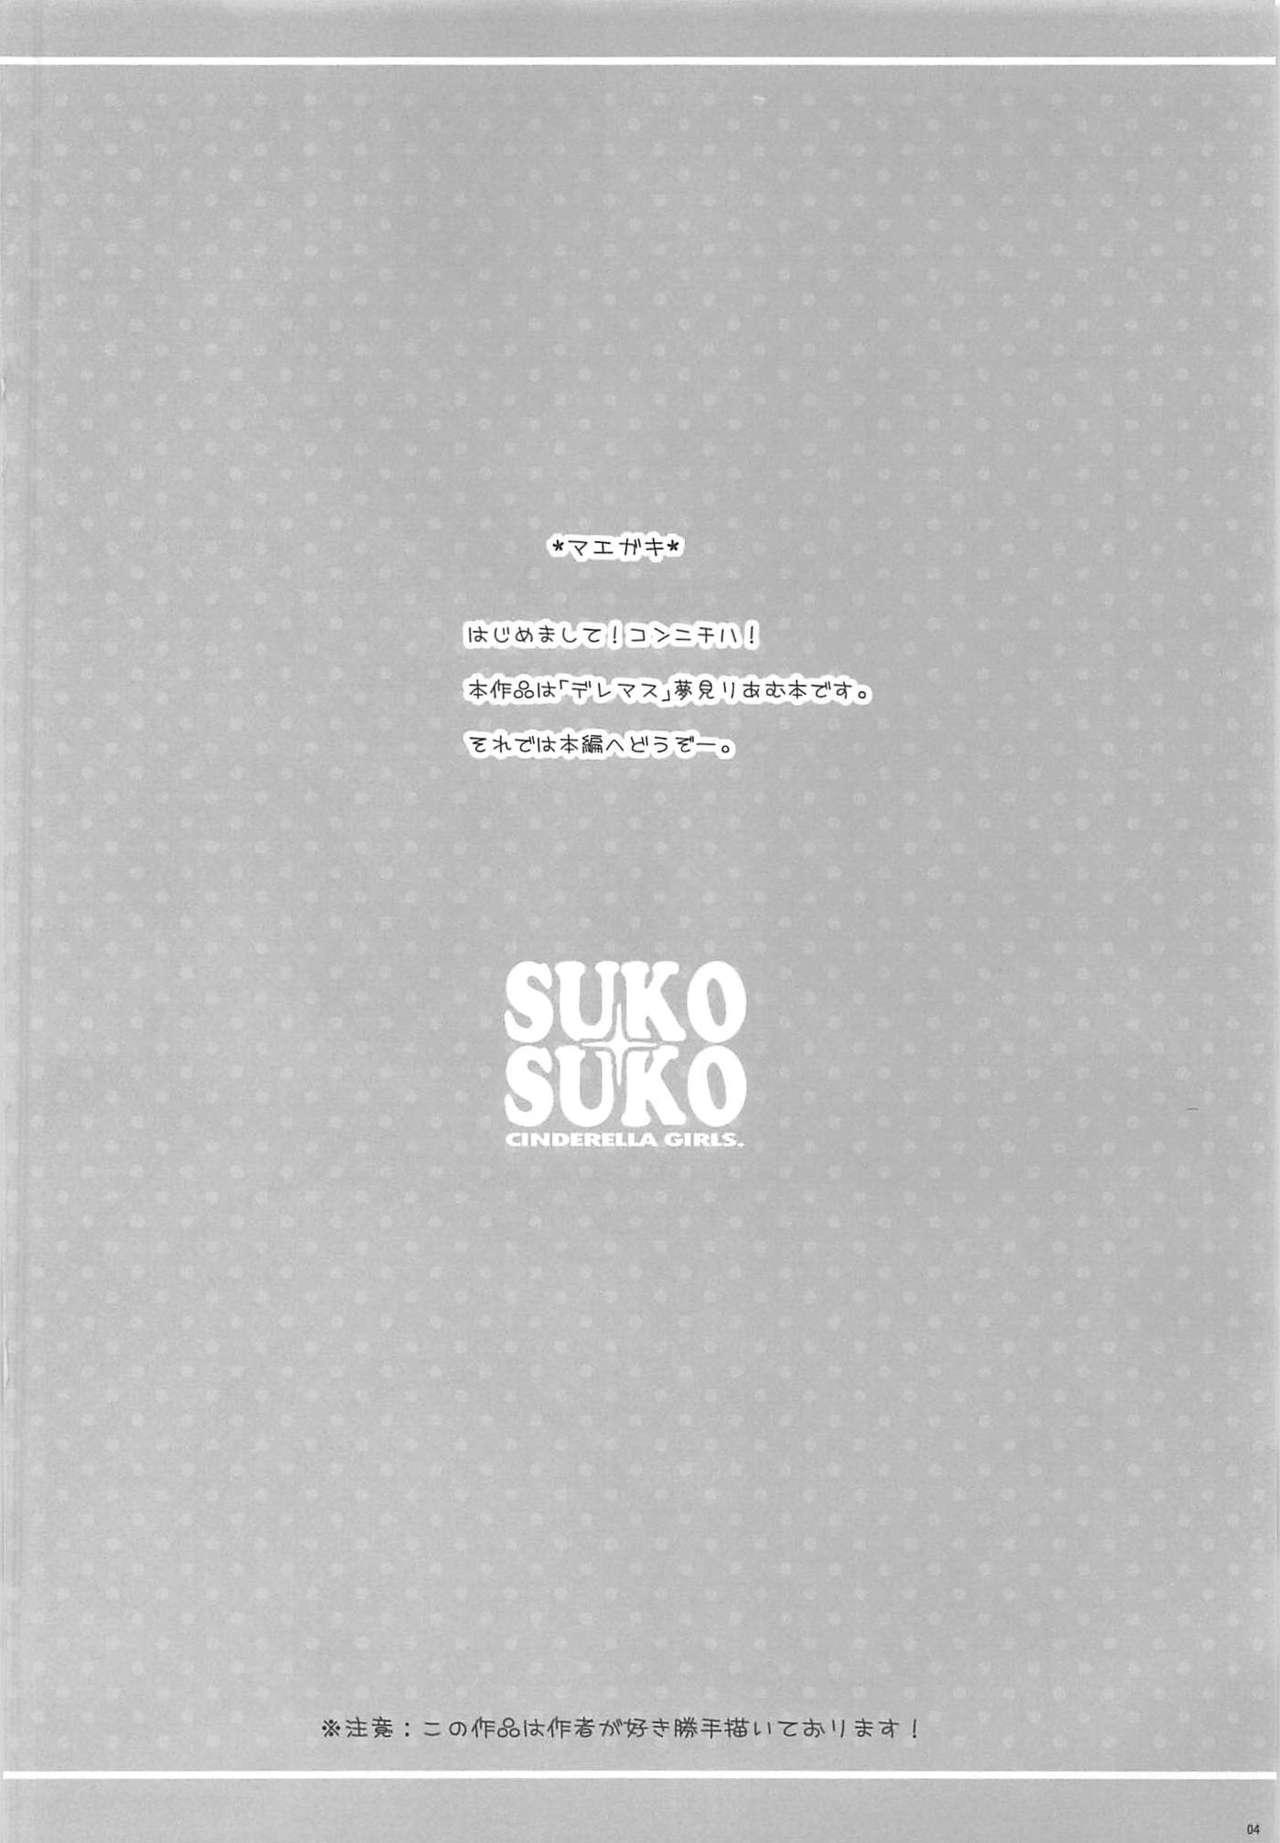 SUKO + SUKO 2